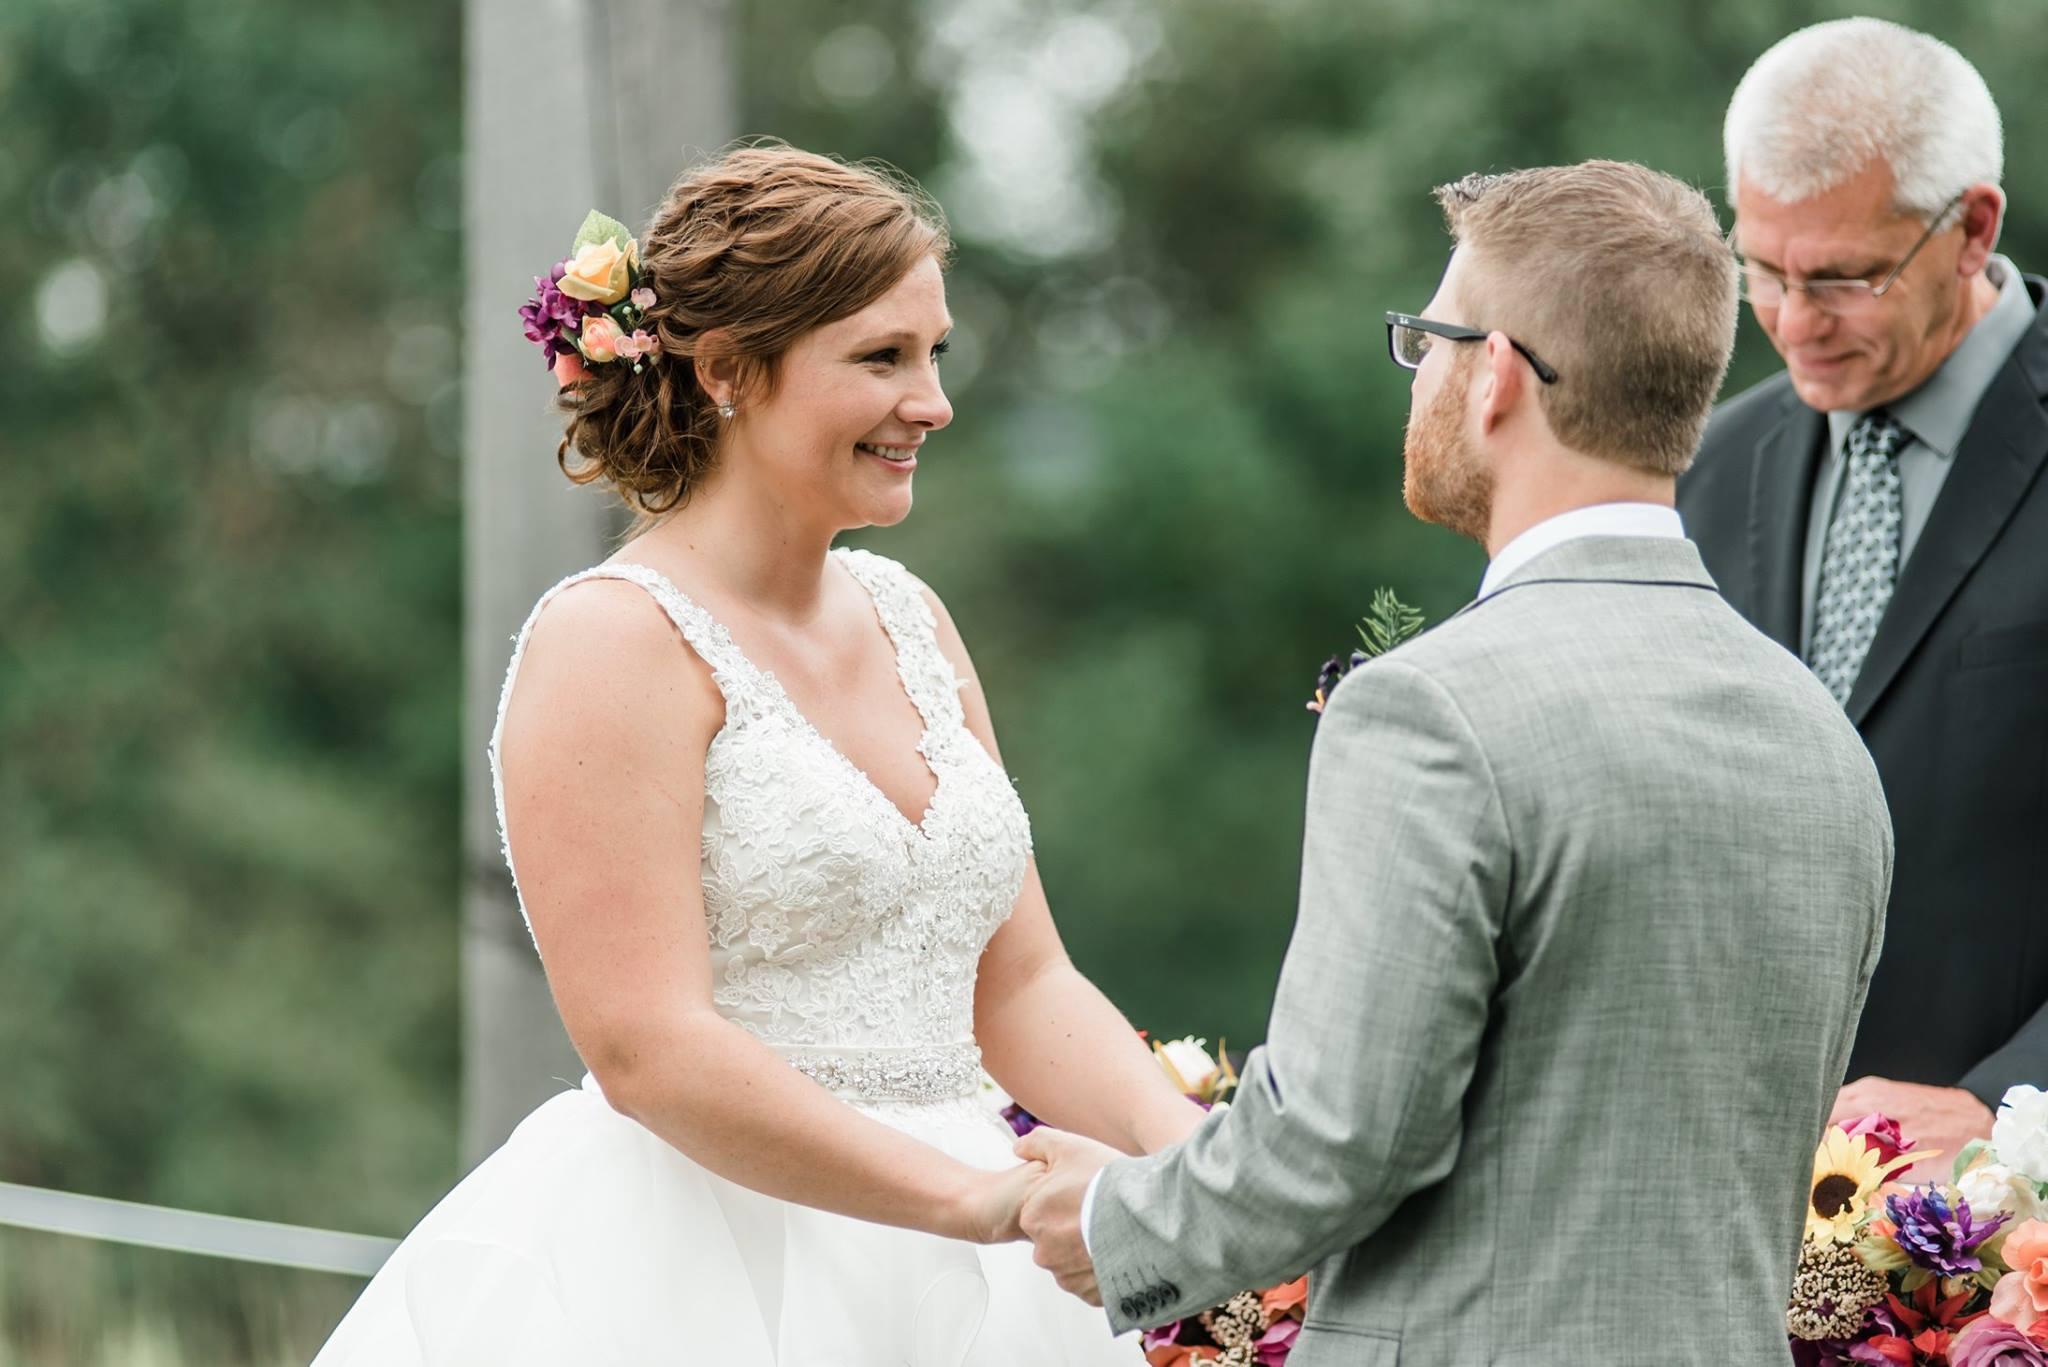 pennsylvania-backyard-wedding-love-diy-bohemian-romantic-colorful-0025.jpg